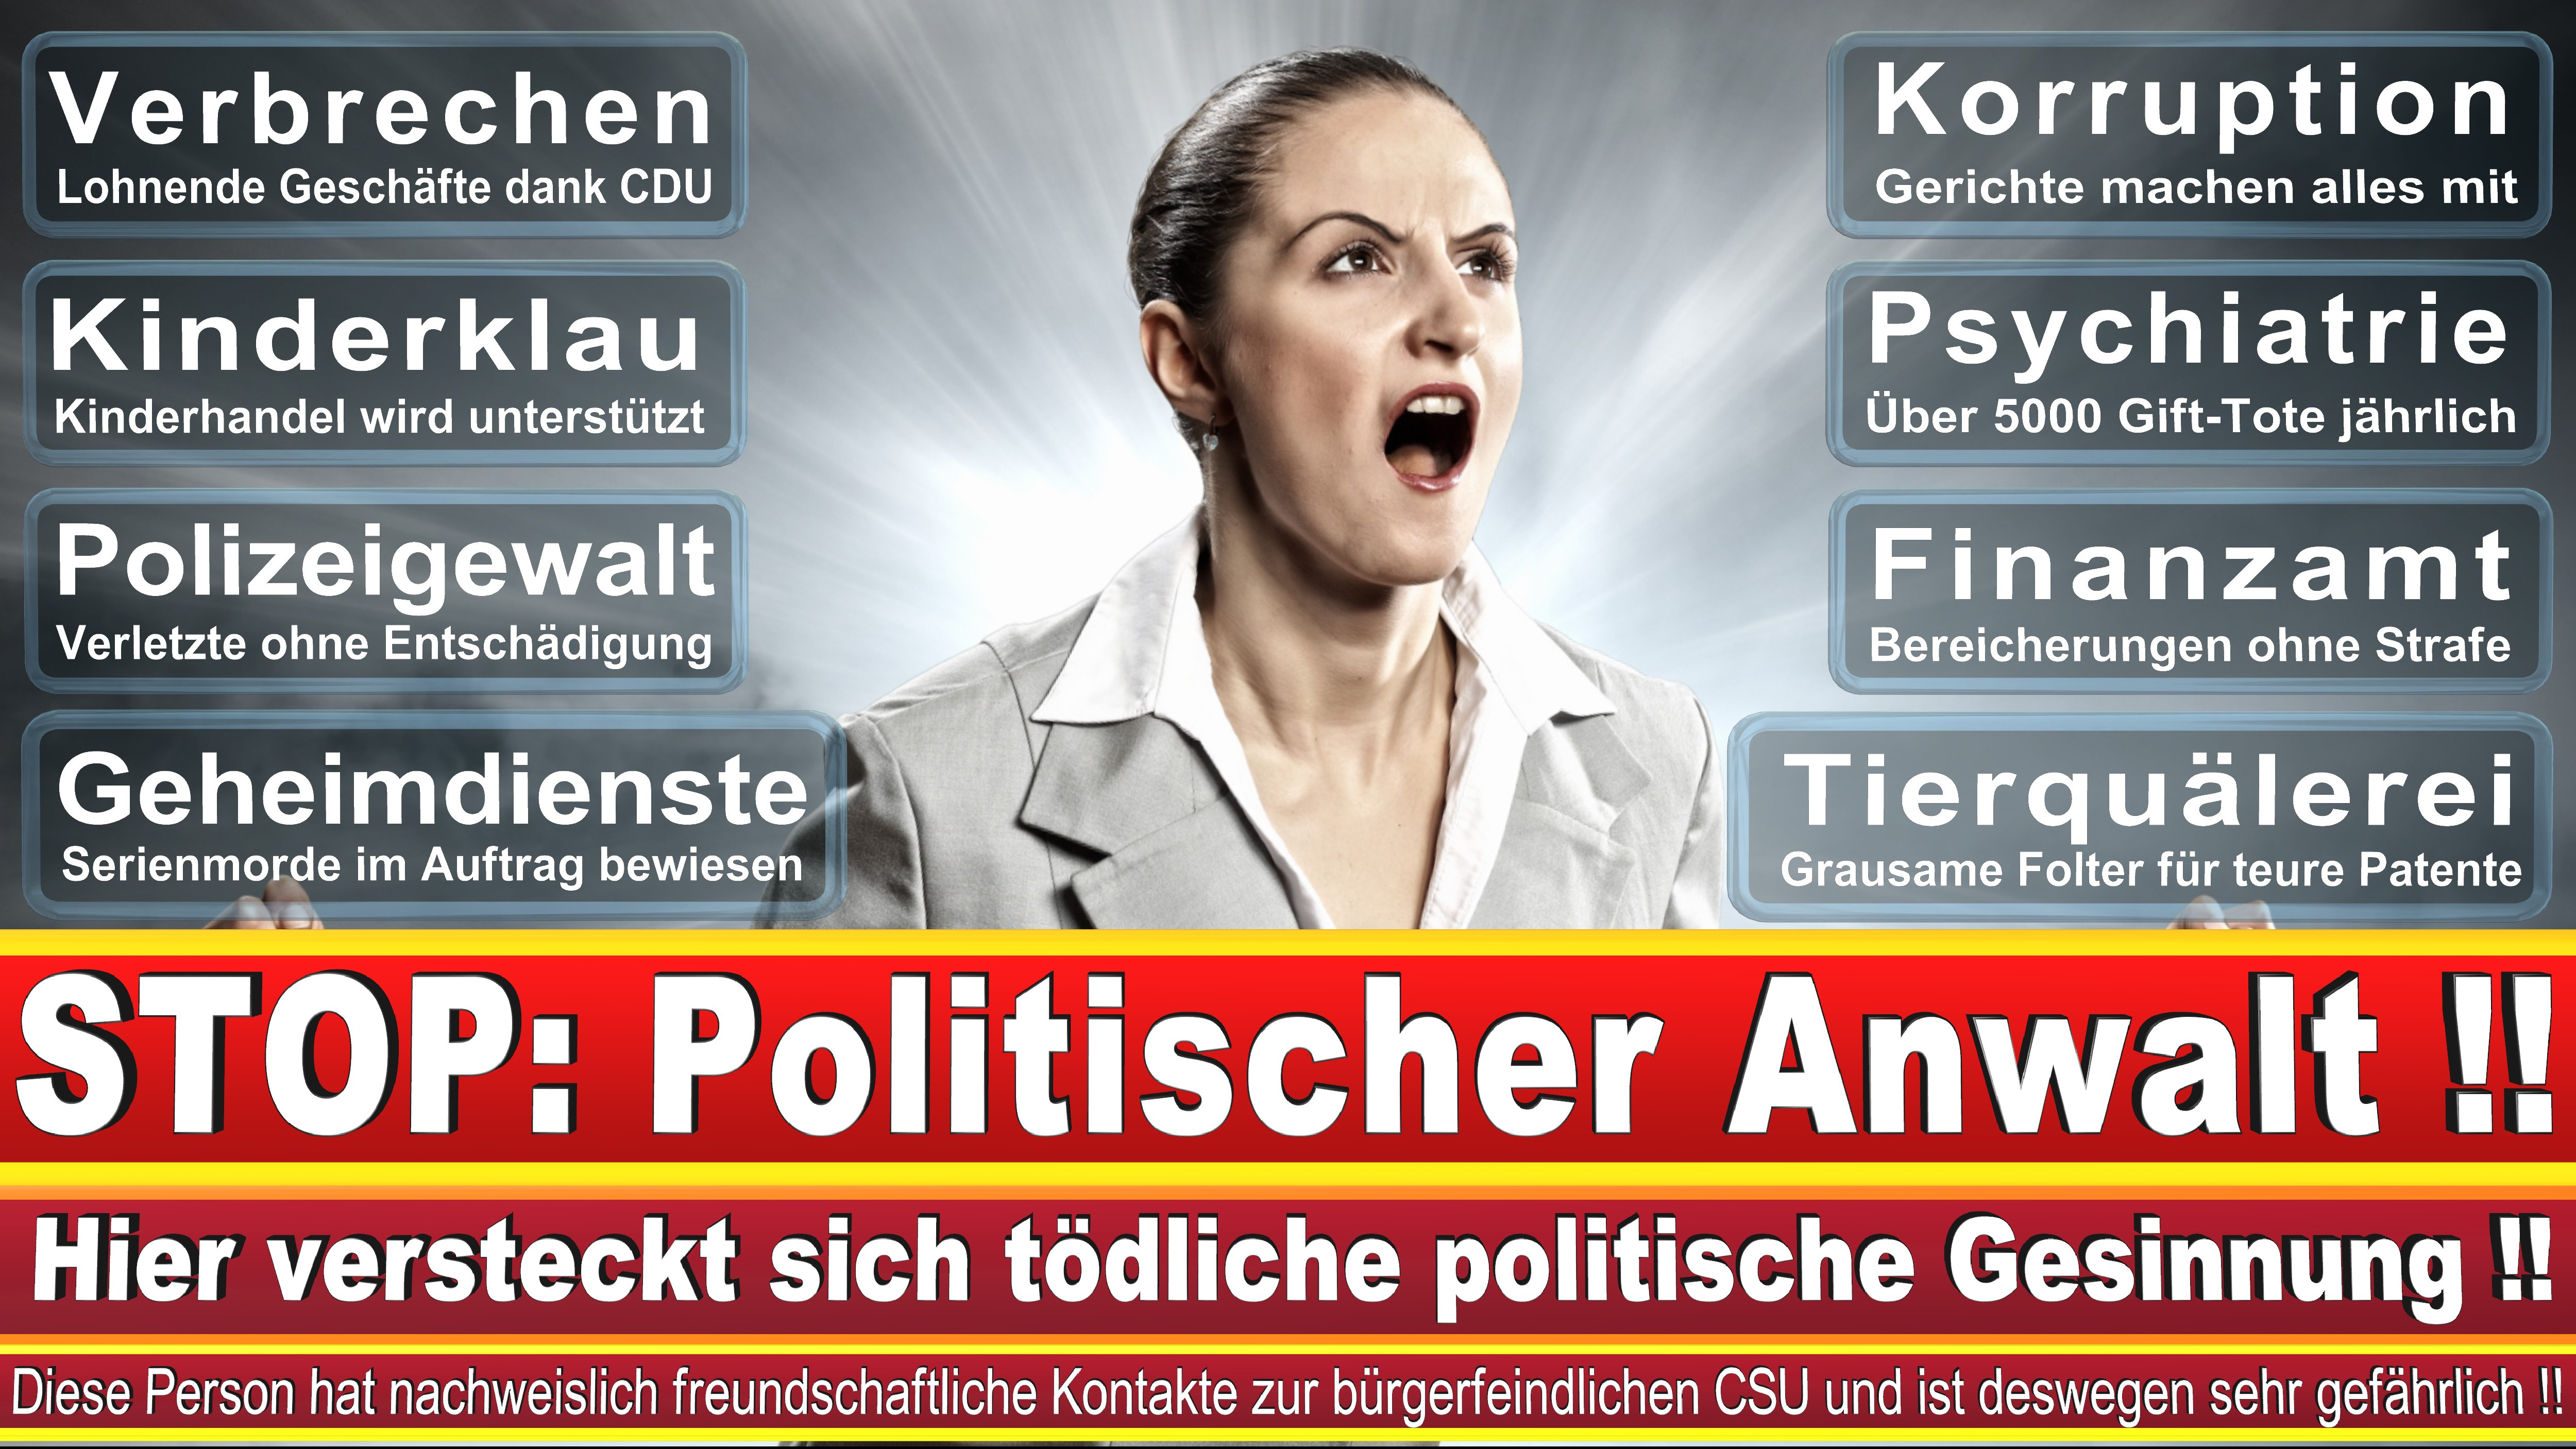 Rechtsanwalt Steffen Vogel Schweinfurt Selbstständig Rechtsanwalt Und Fachanwalt F Arbeitsrecht Rechtsanwaltskanzlei Blatt Kollegen 1